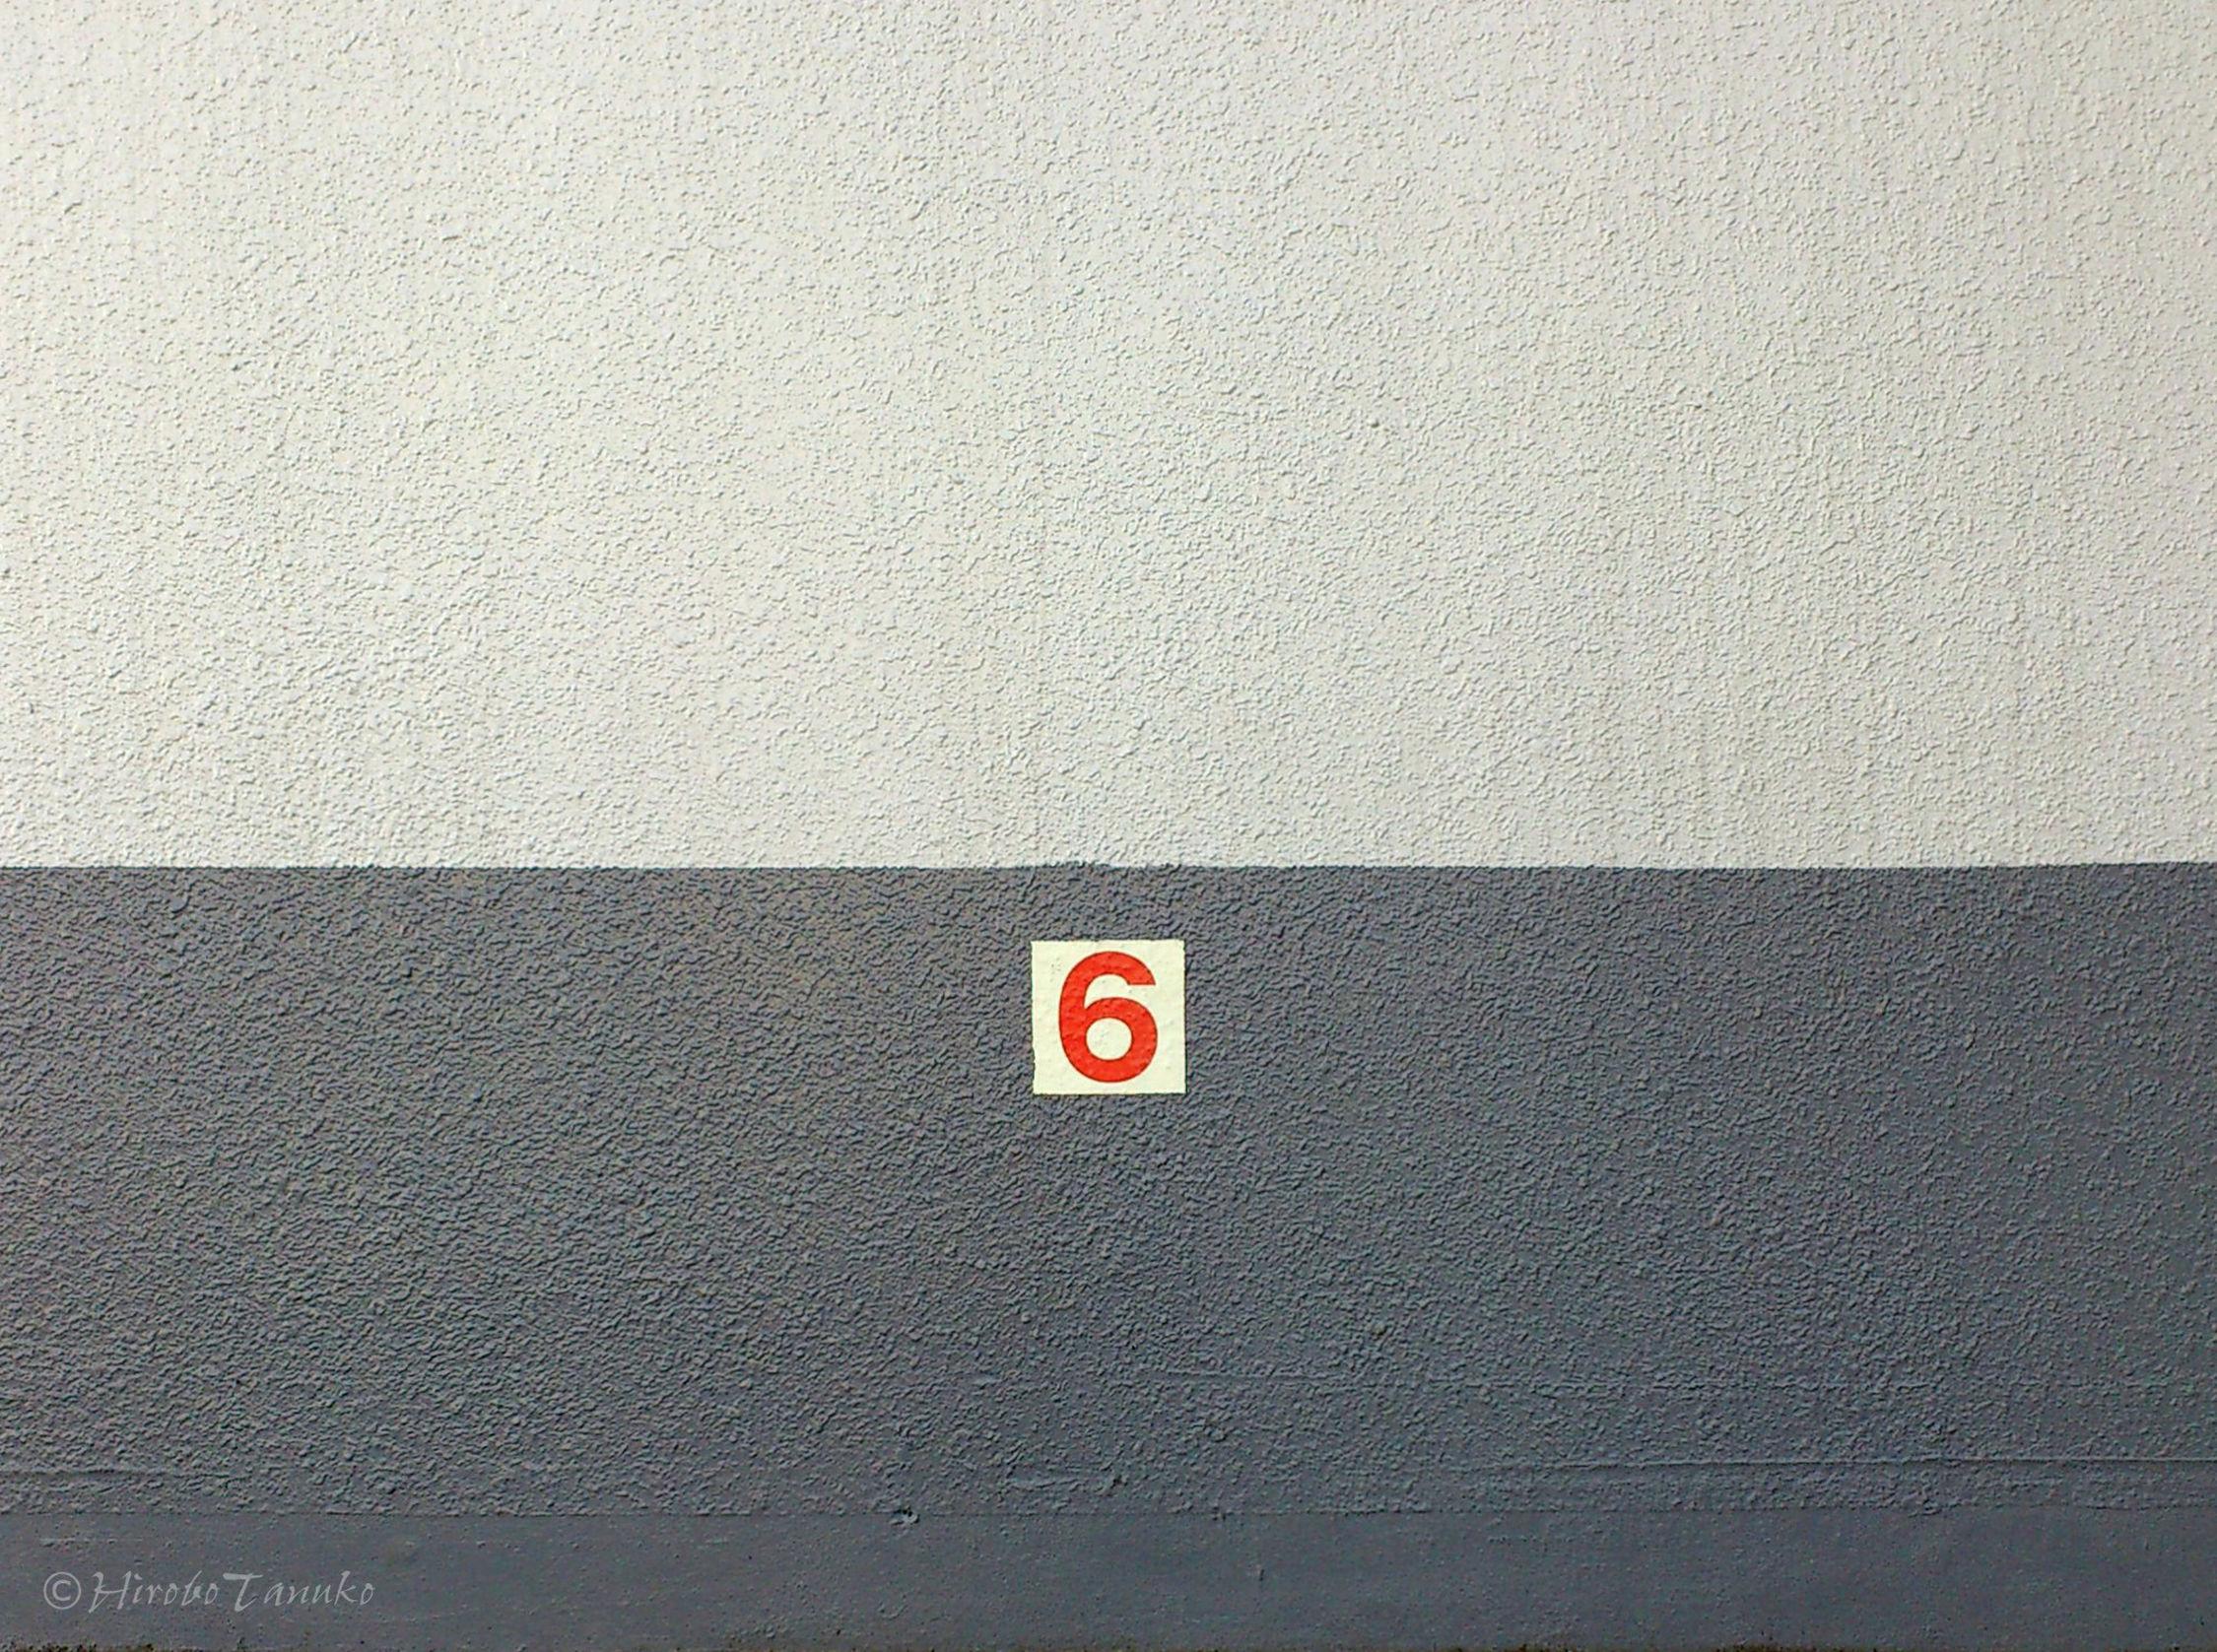 6 Numbers Wall Minimalism Supernormal Negative Space